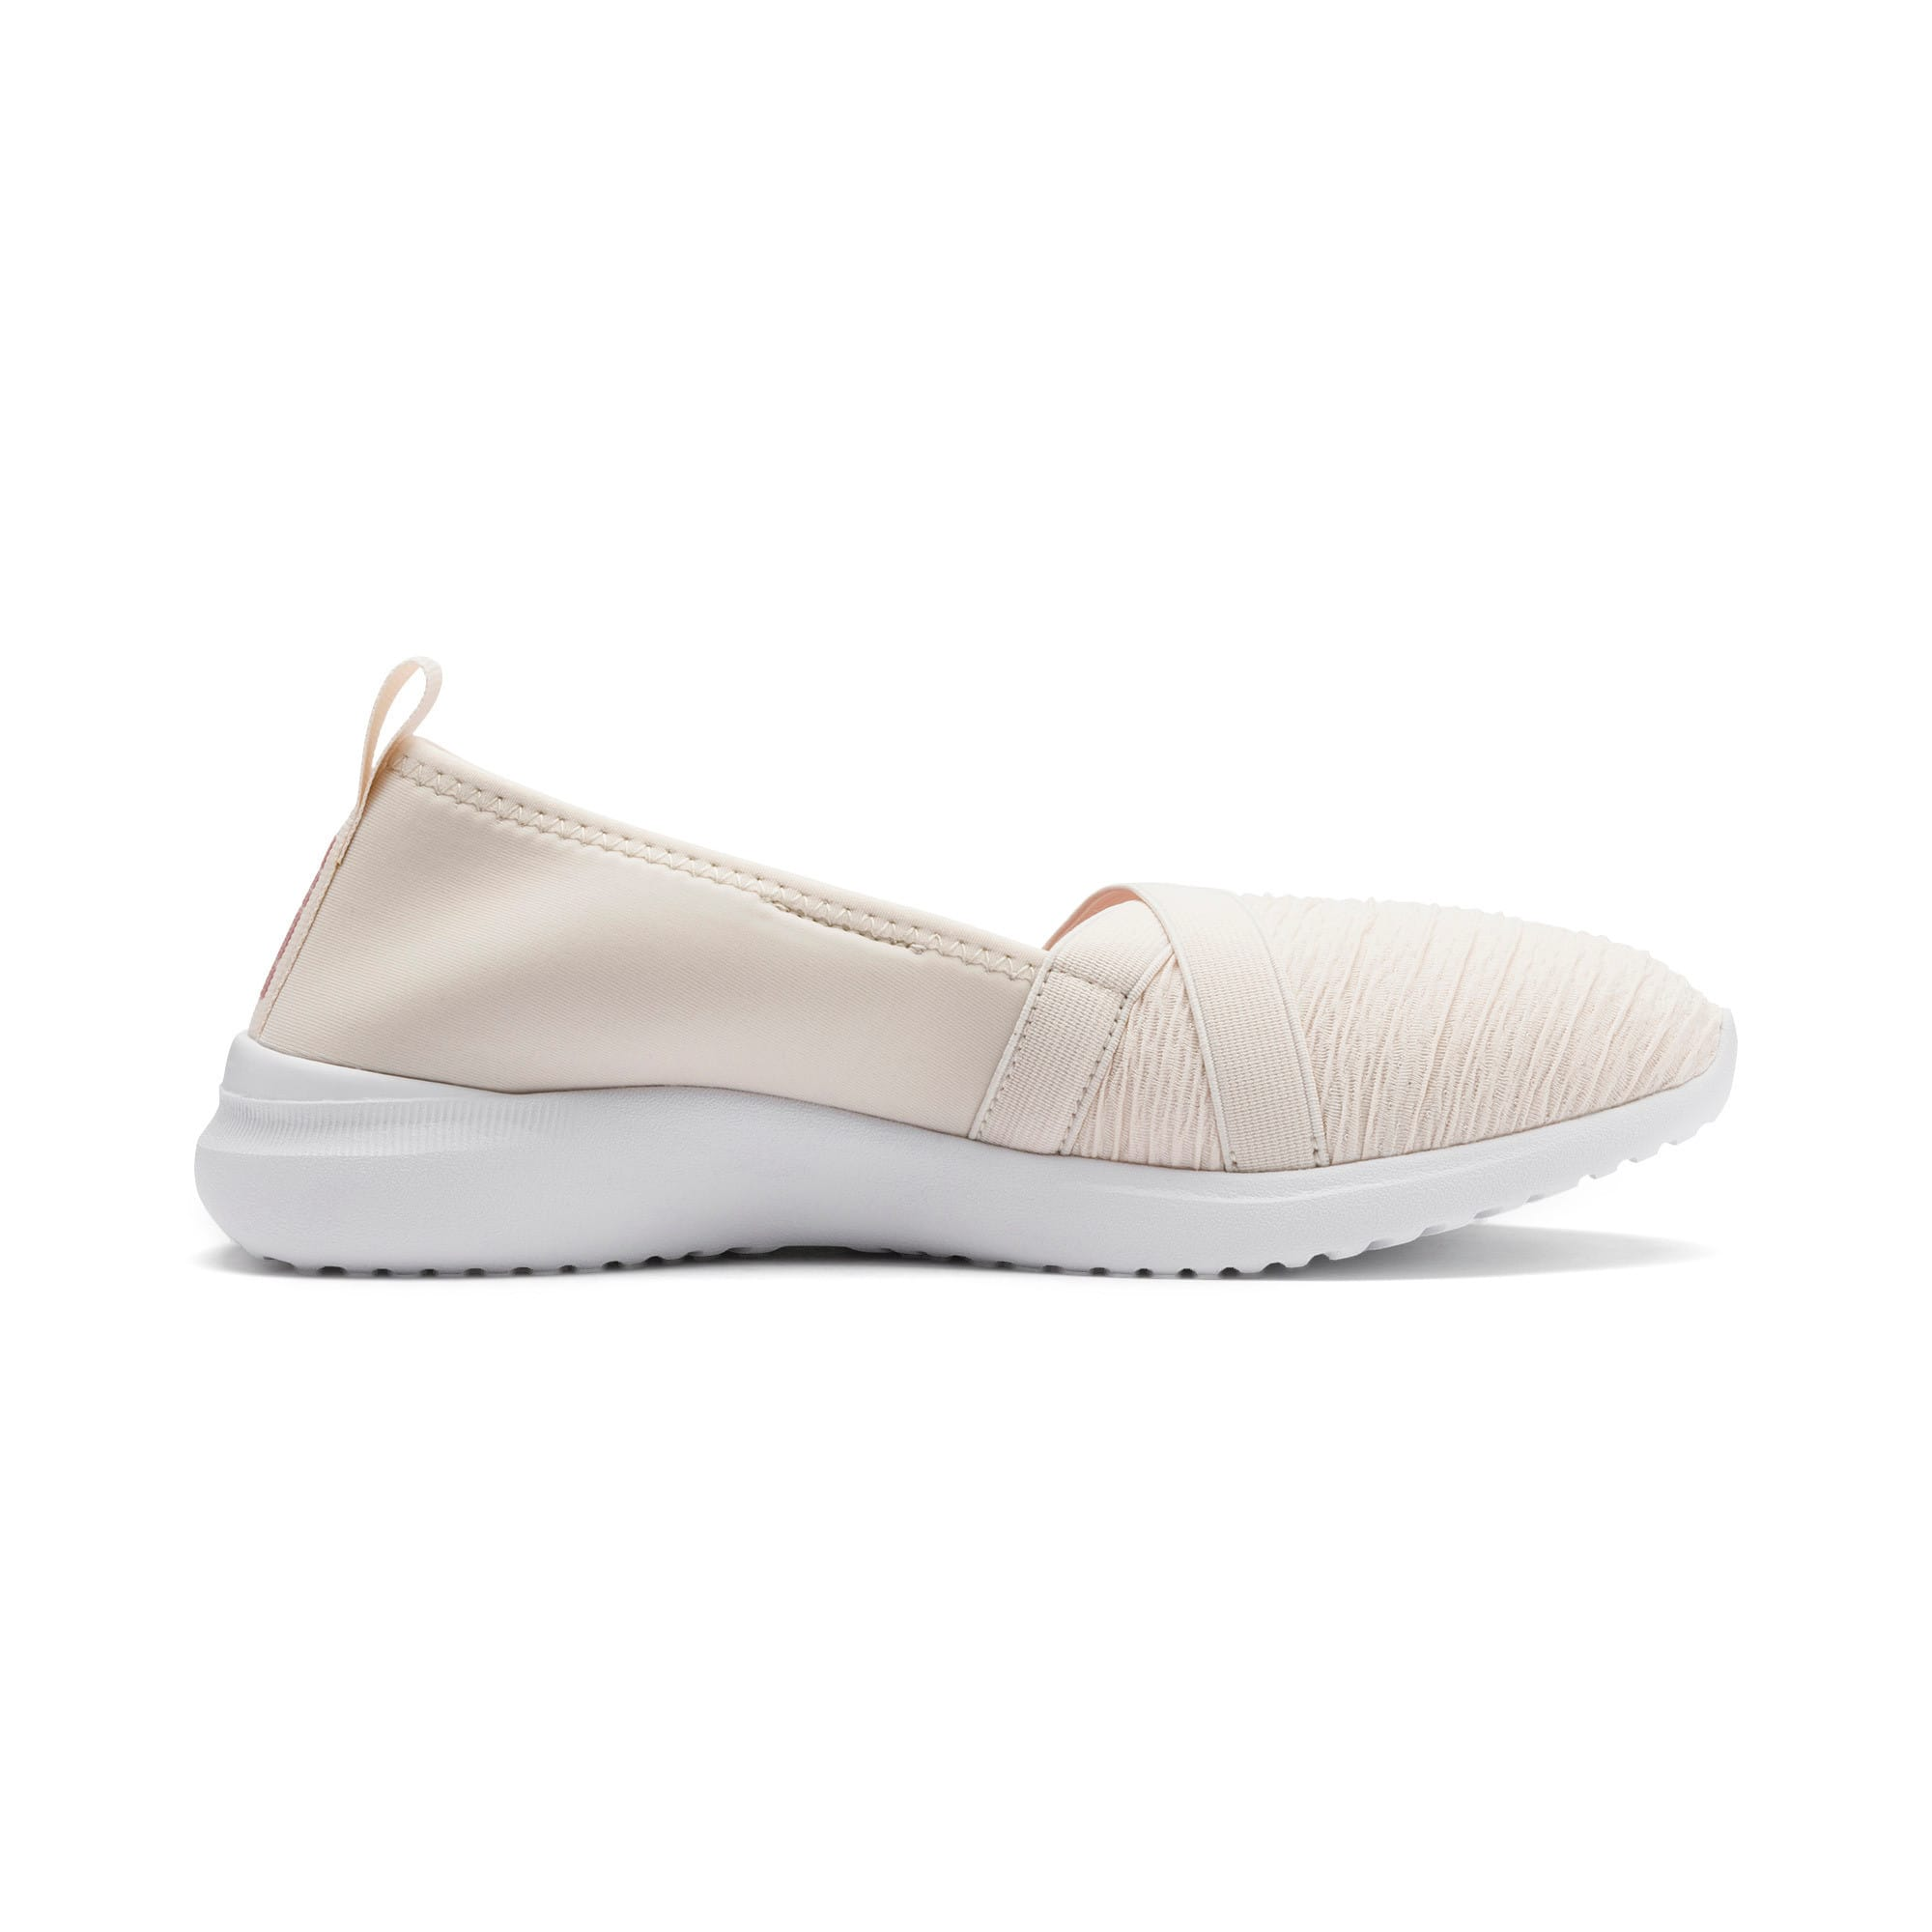 Thumbnail 6 of Adelina Women's Ballet Shoes, Pastel Parchment-B Rose-Wht, medium